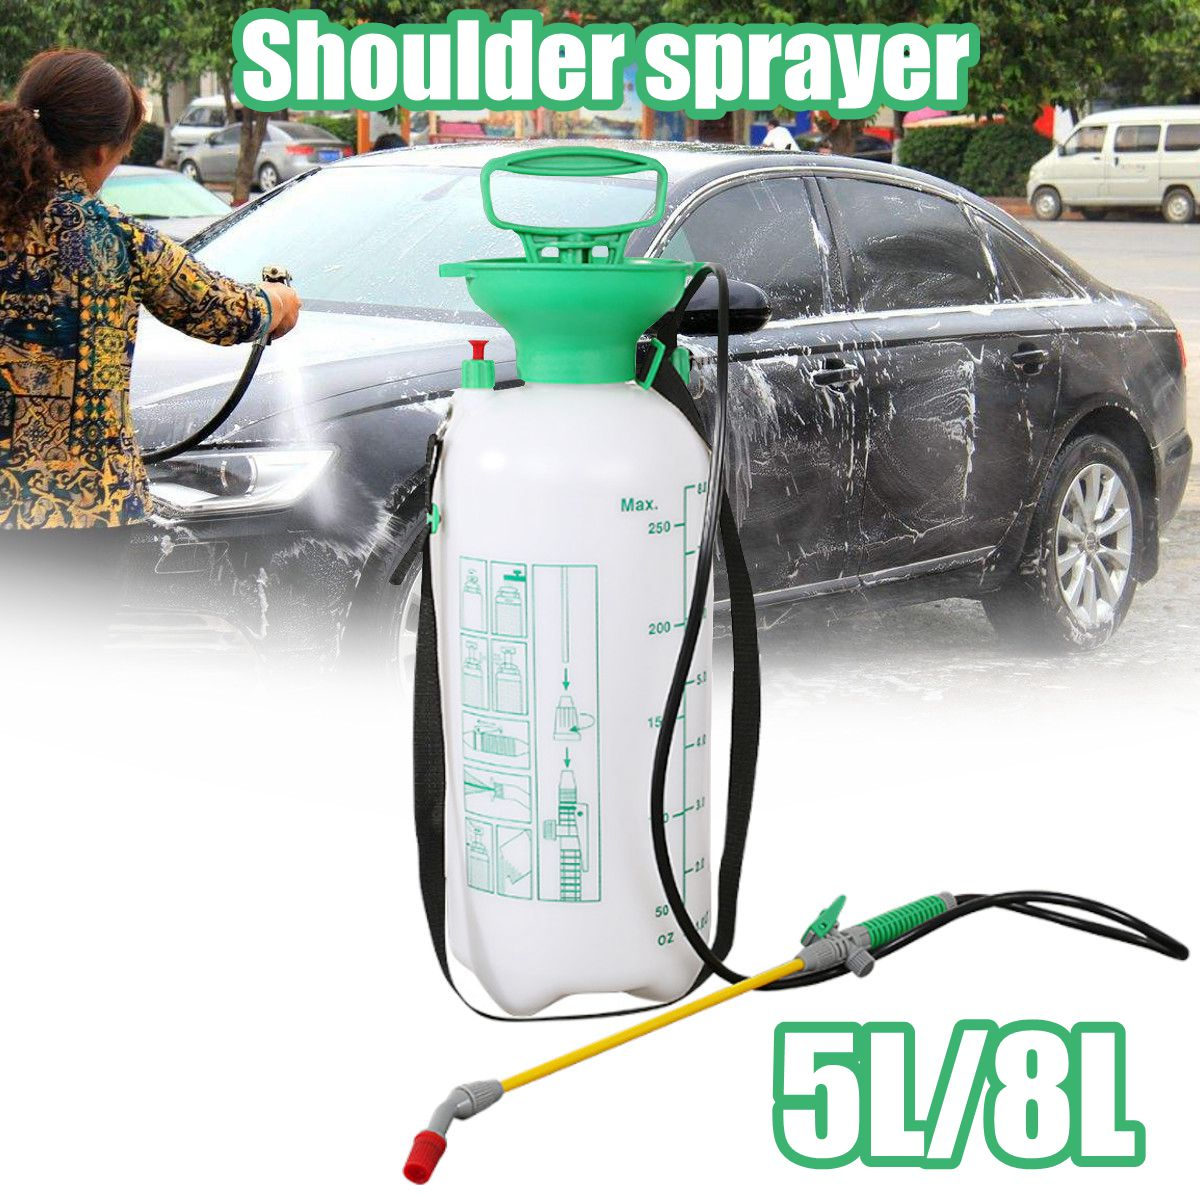 Portable 8L/5L Car Washing Pressure Spray Pot Auto Clean Pump Sprayer Bottle Pressurized Spray Bottle High Corrosion Resistance